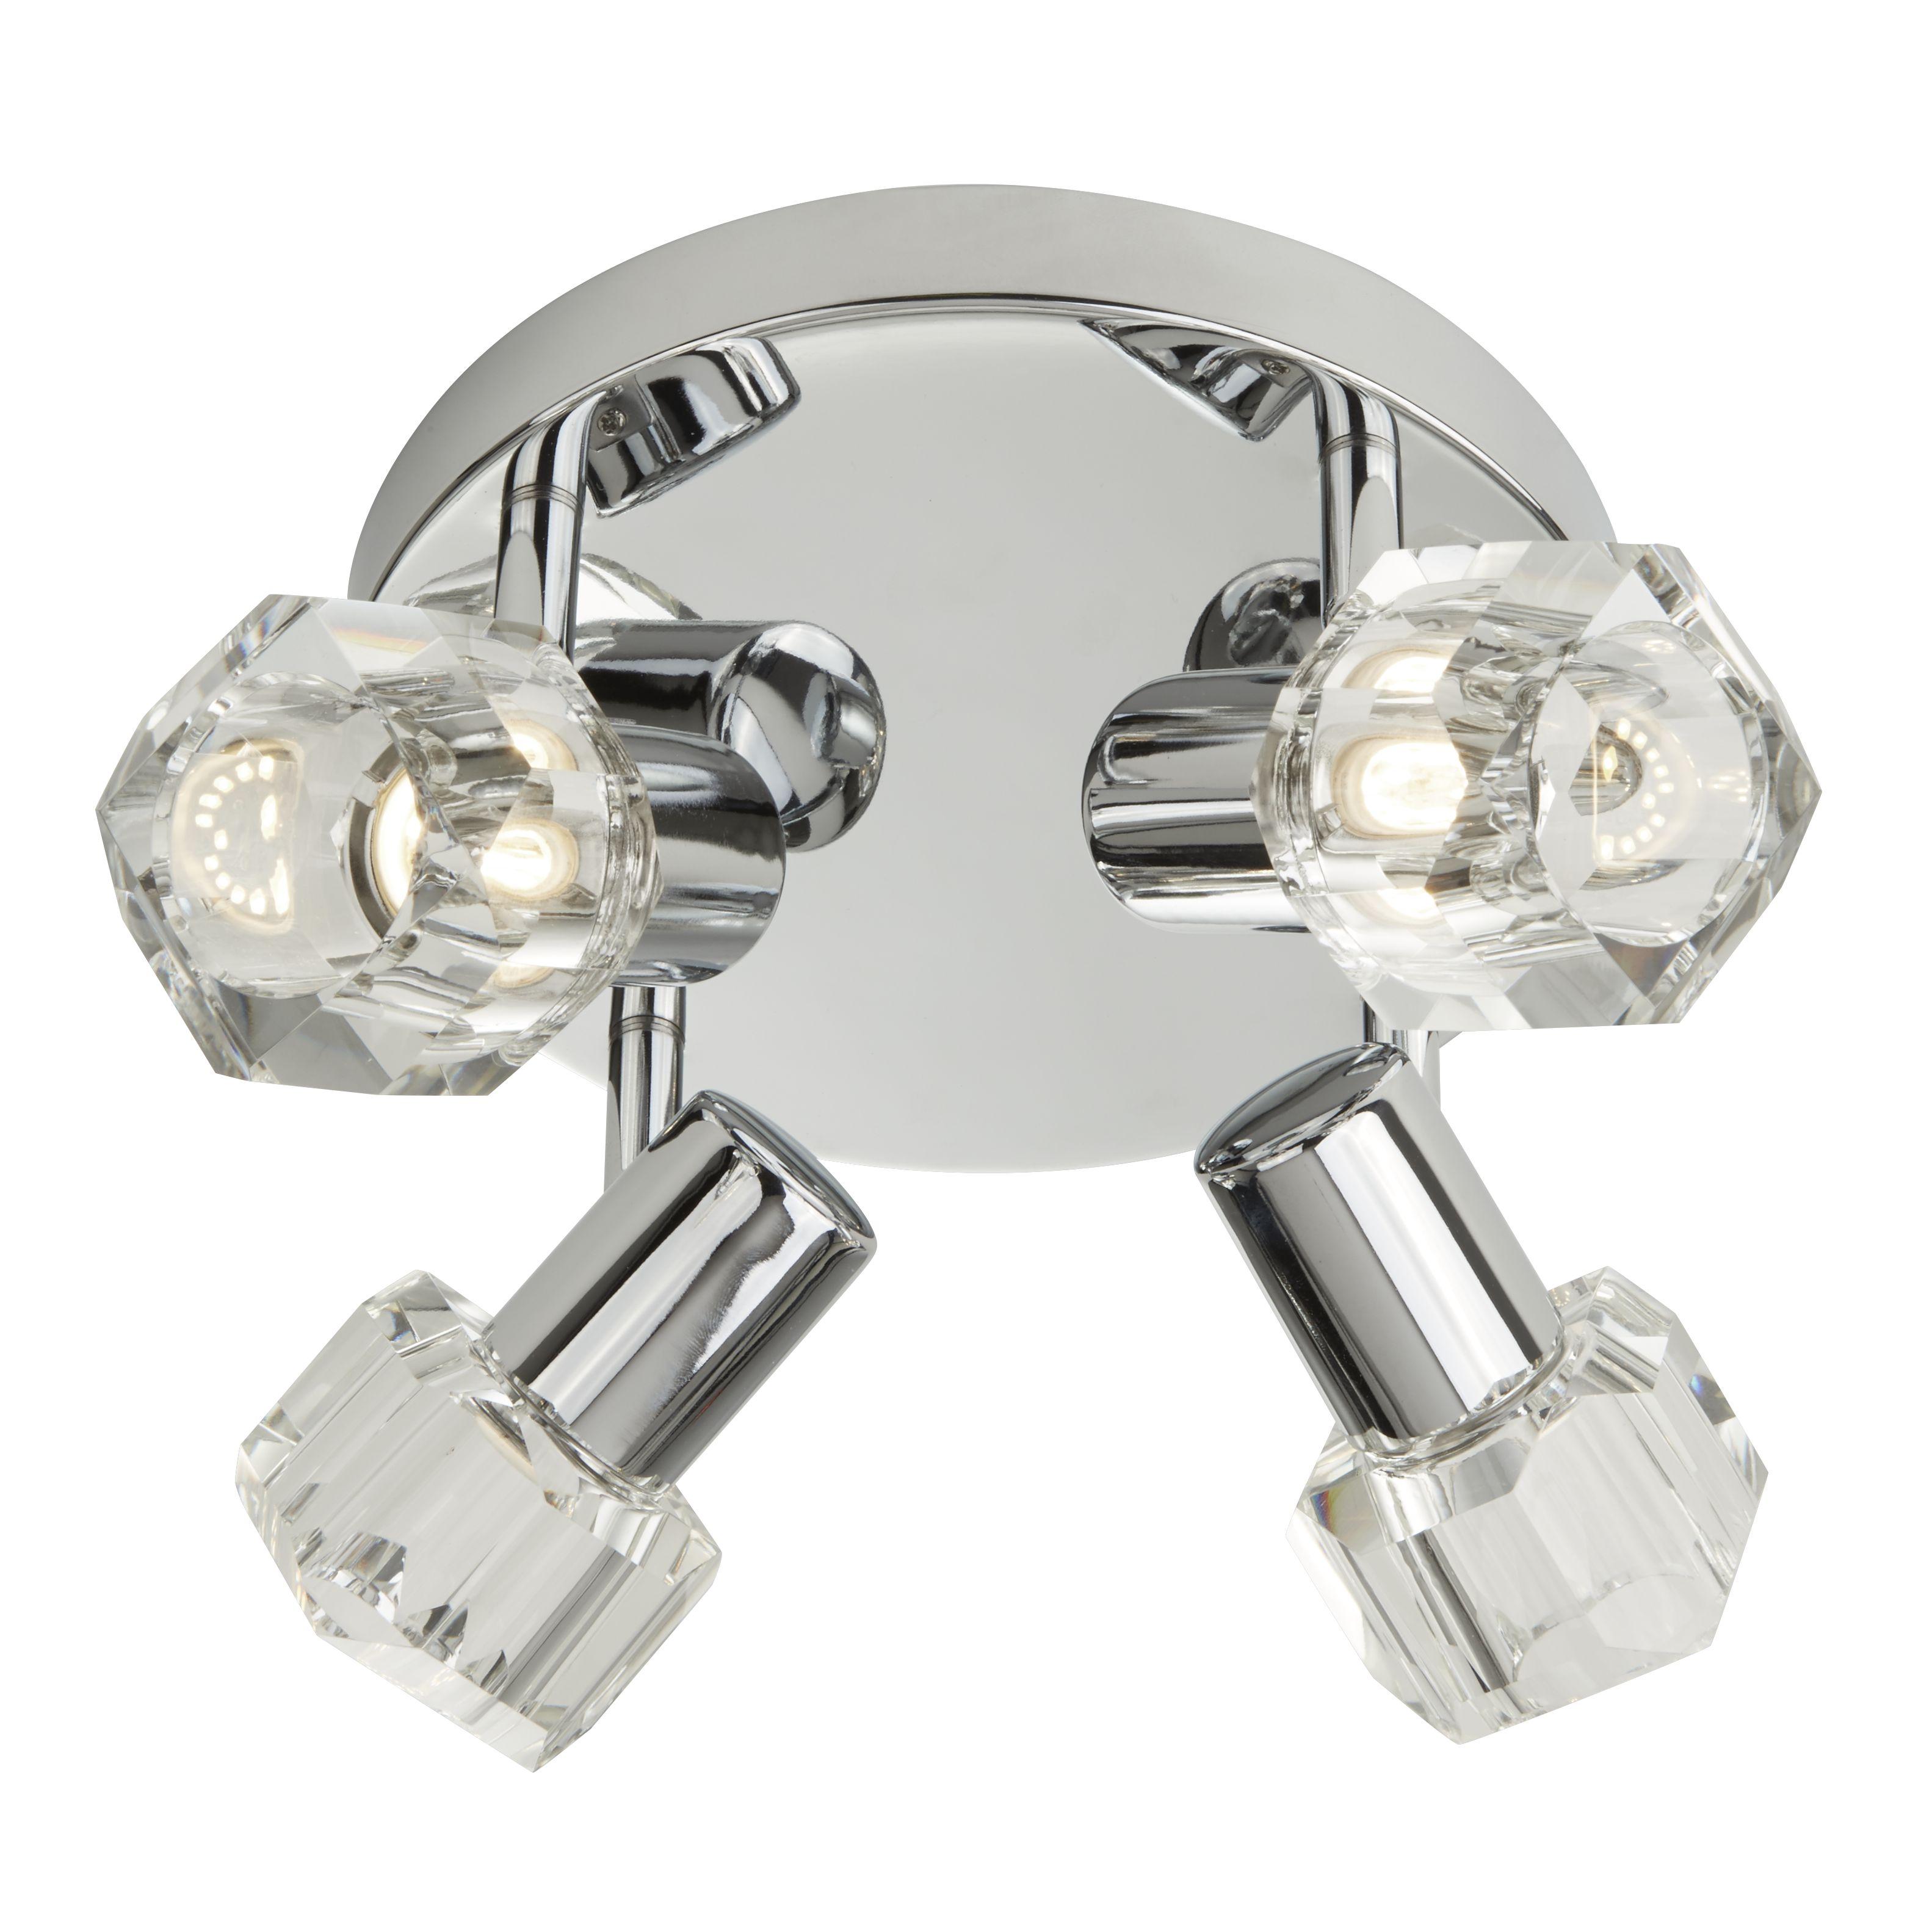 Triton Chrome 4 Light Spotlight With Clear Glass Shades